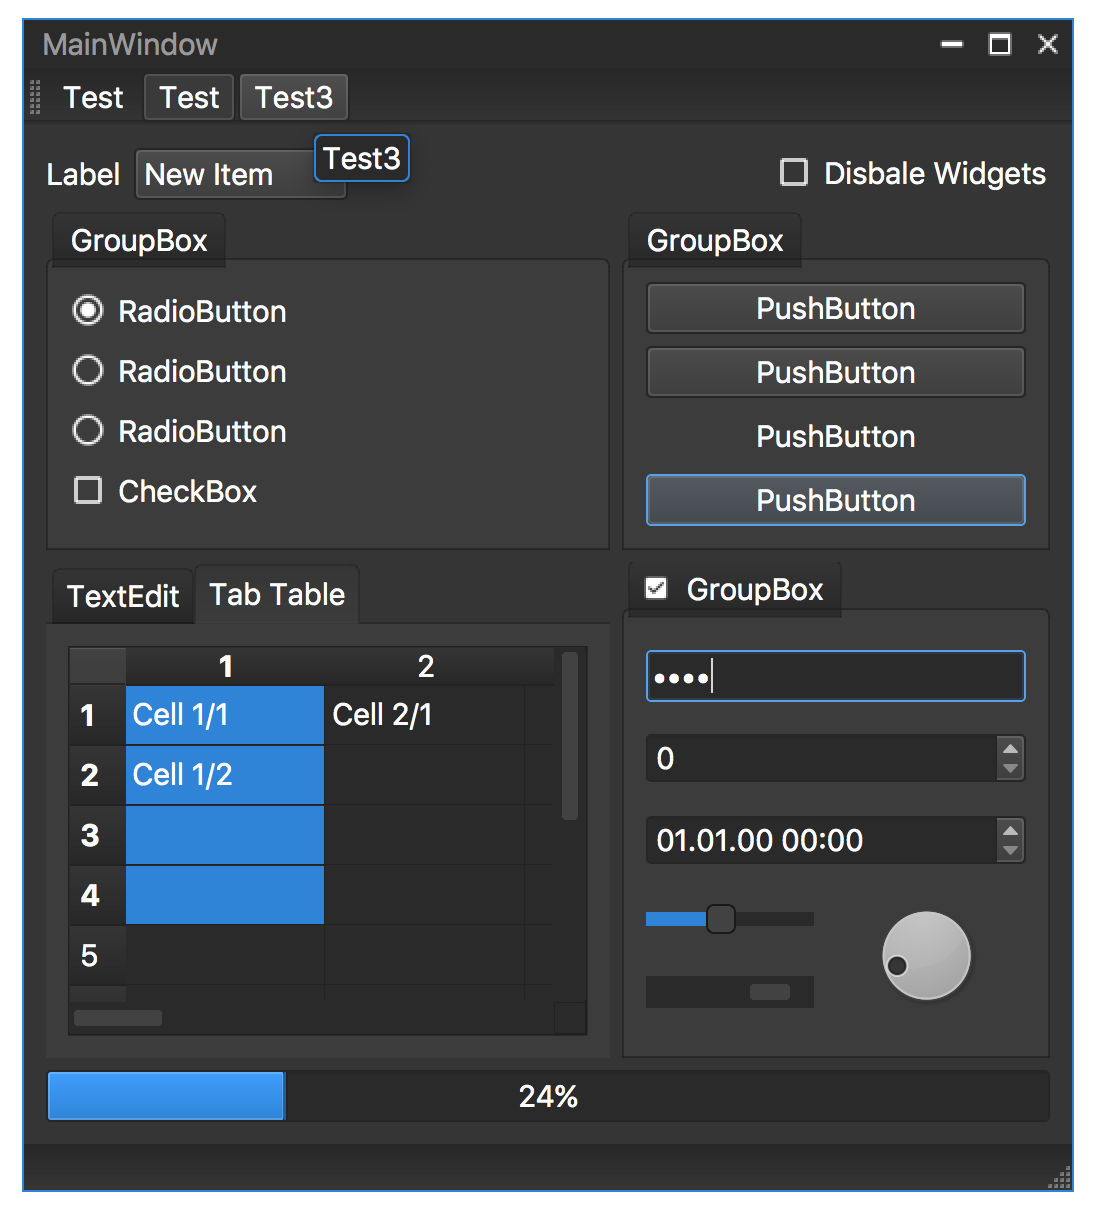 screenshot qt frameless window with custom dark style - mac enabled